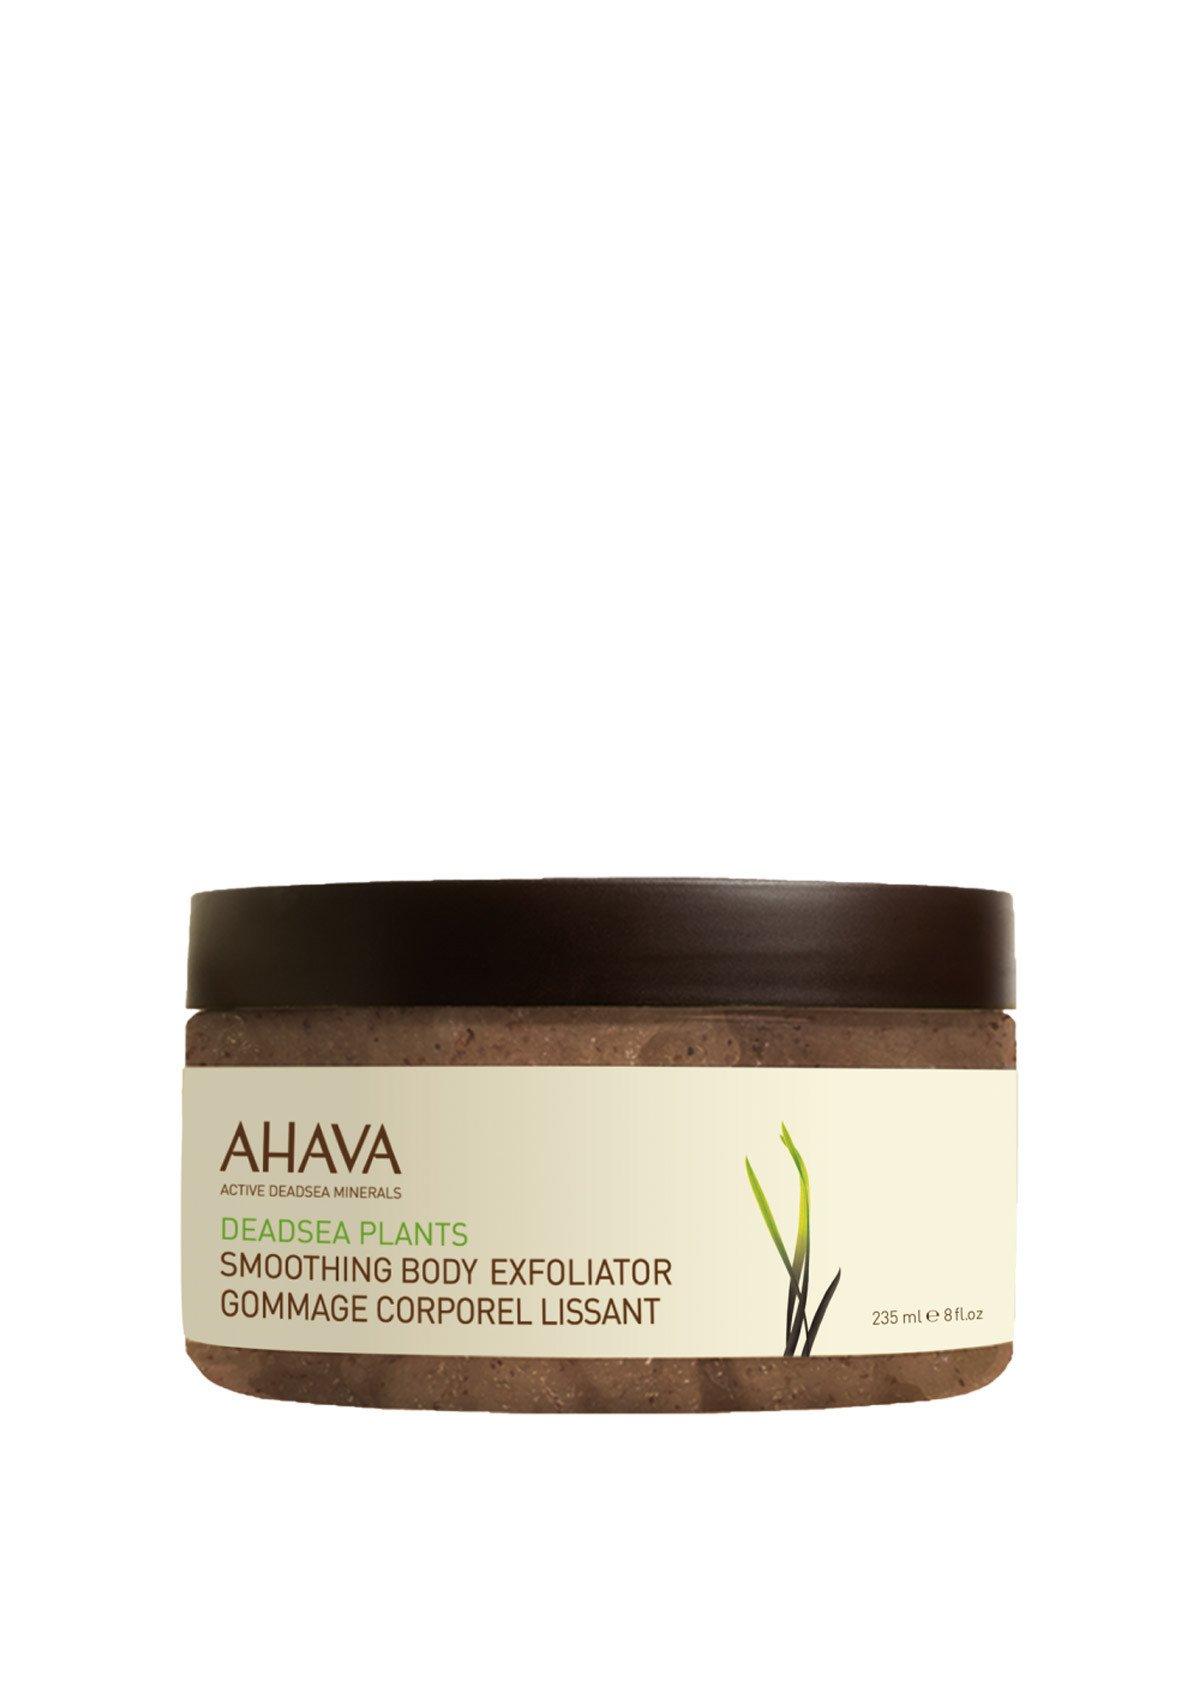 AHAVA - Smoothing Body Exfoliator 235 ml